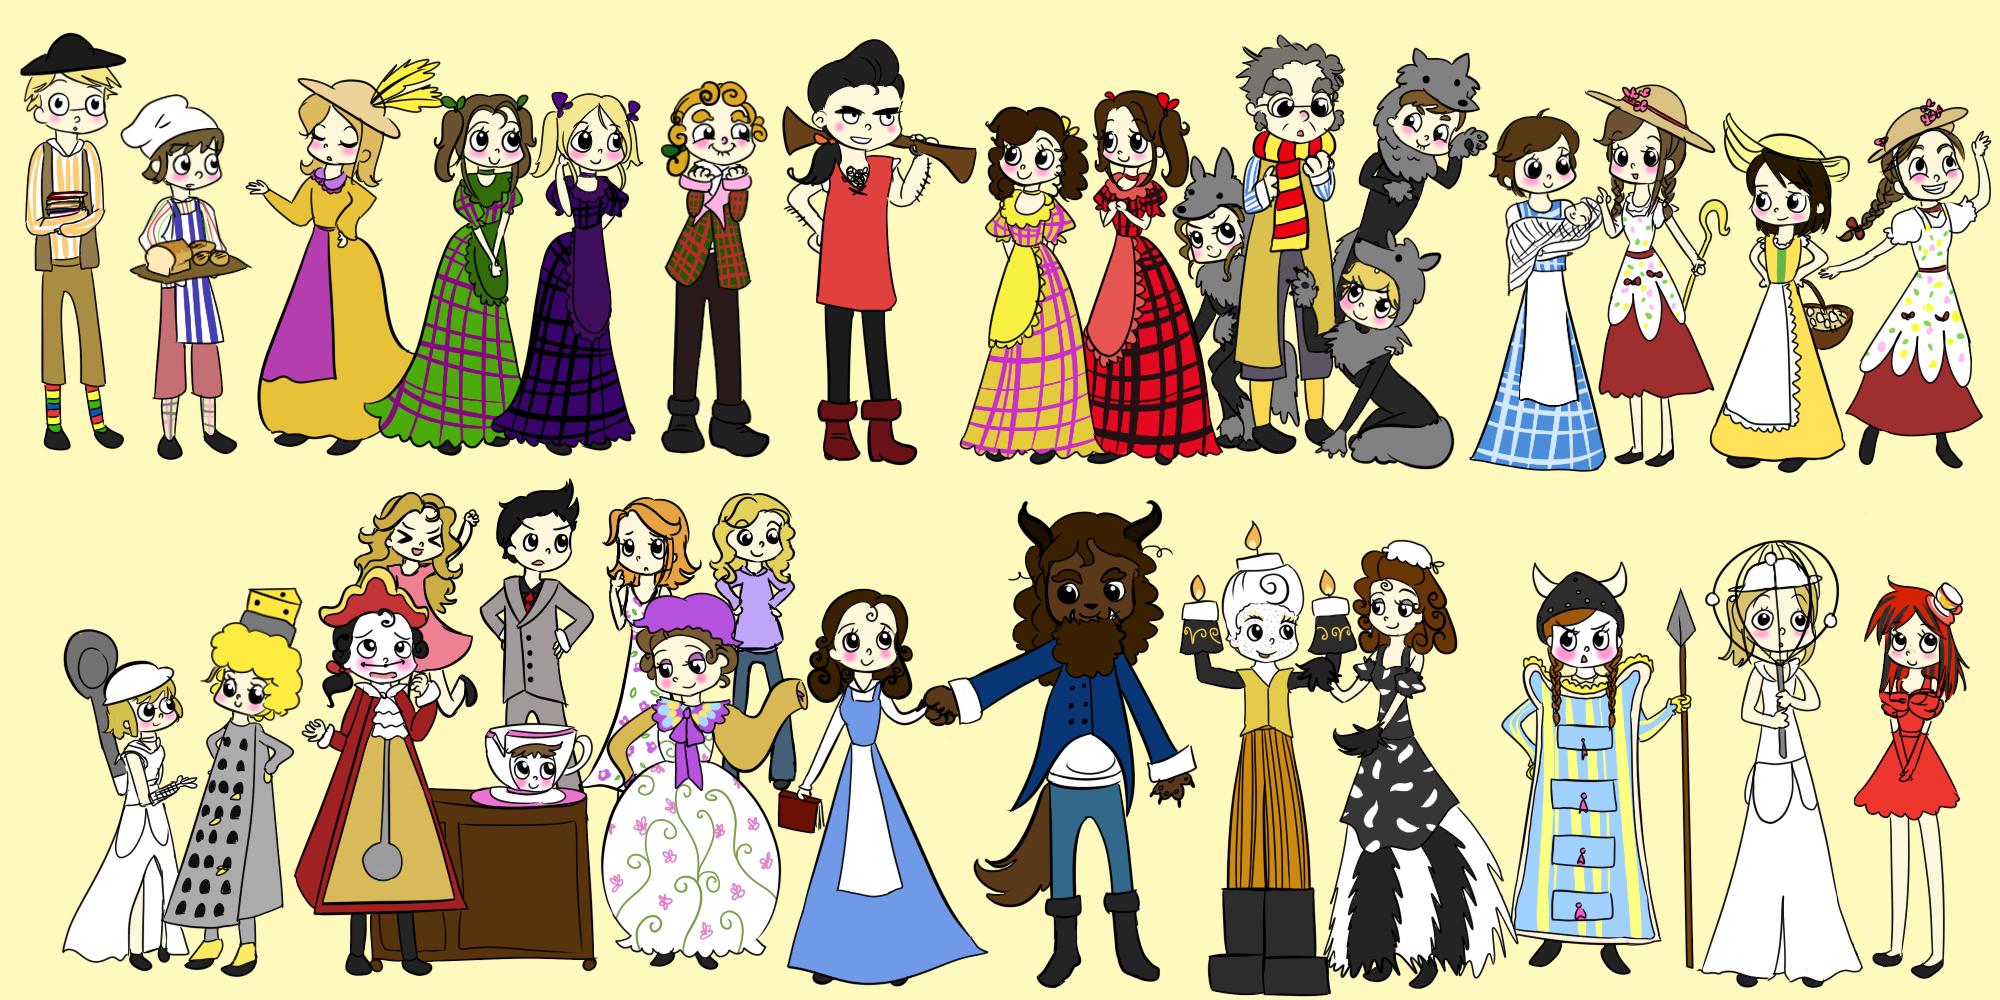 Meowkin 141 85 Cast Of Beauty And The Beast By